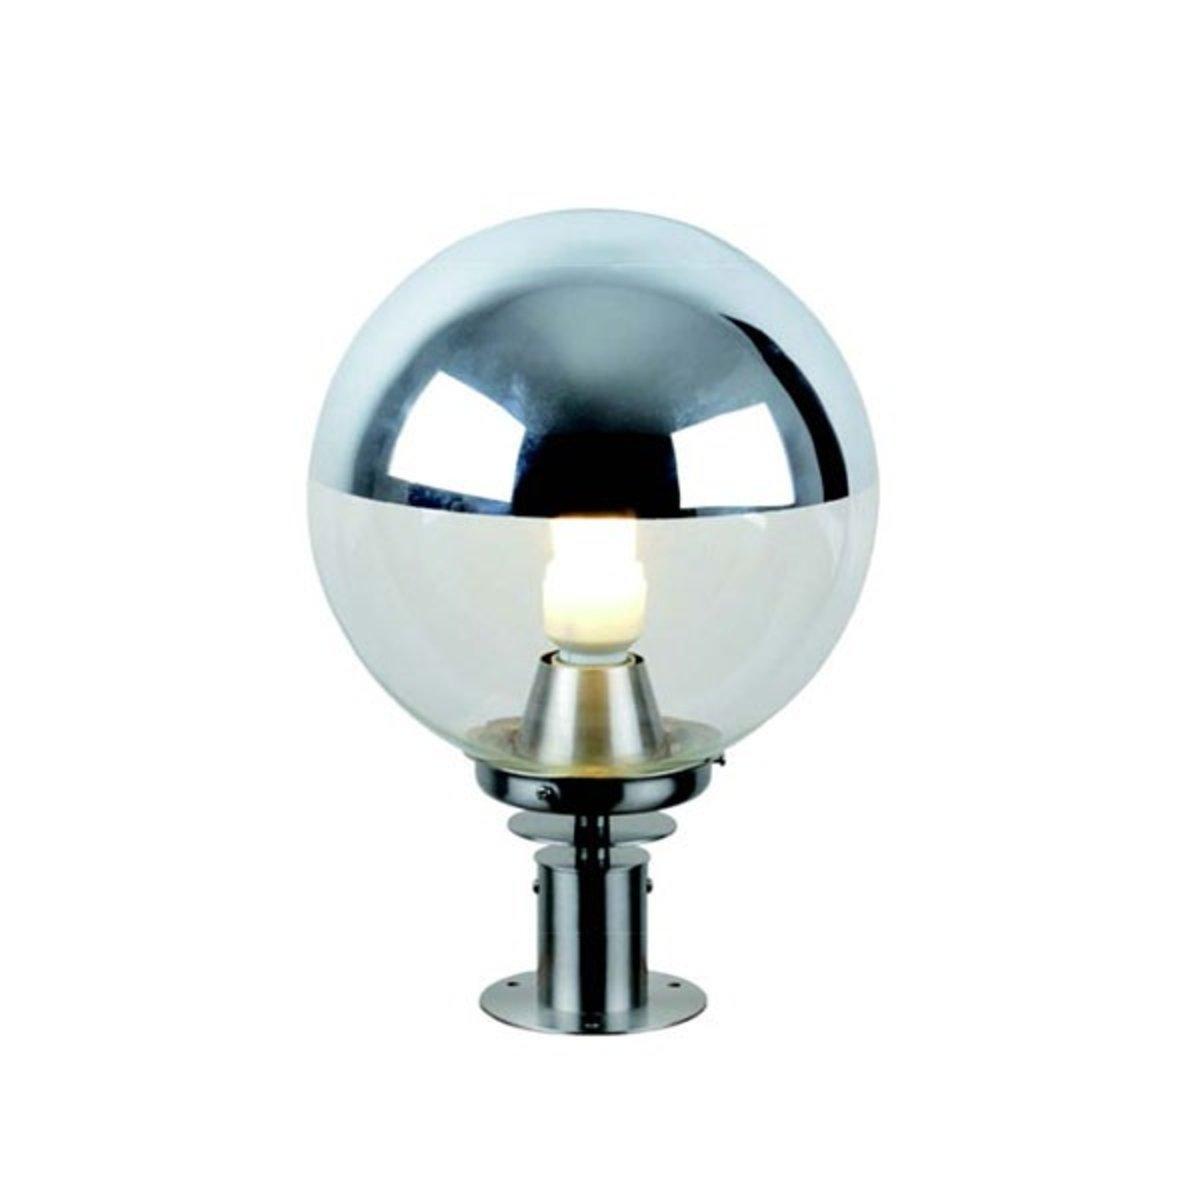 GLASS SPHERE - Bullard Bollards Lighting (2)